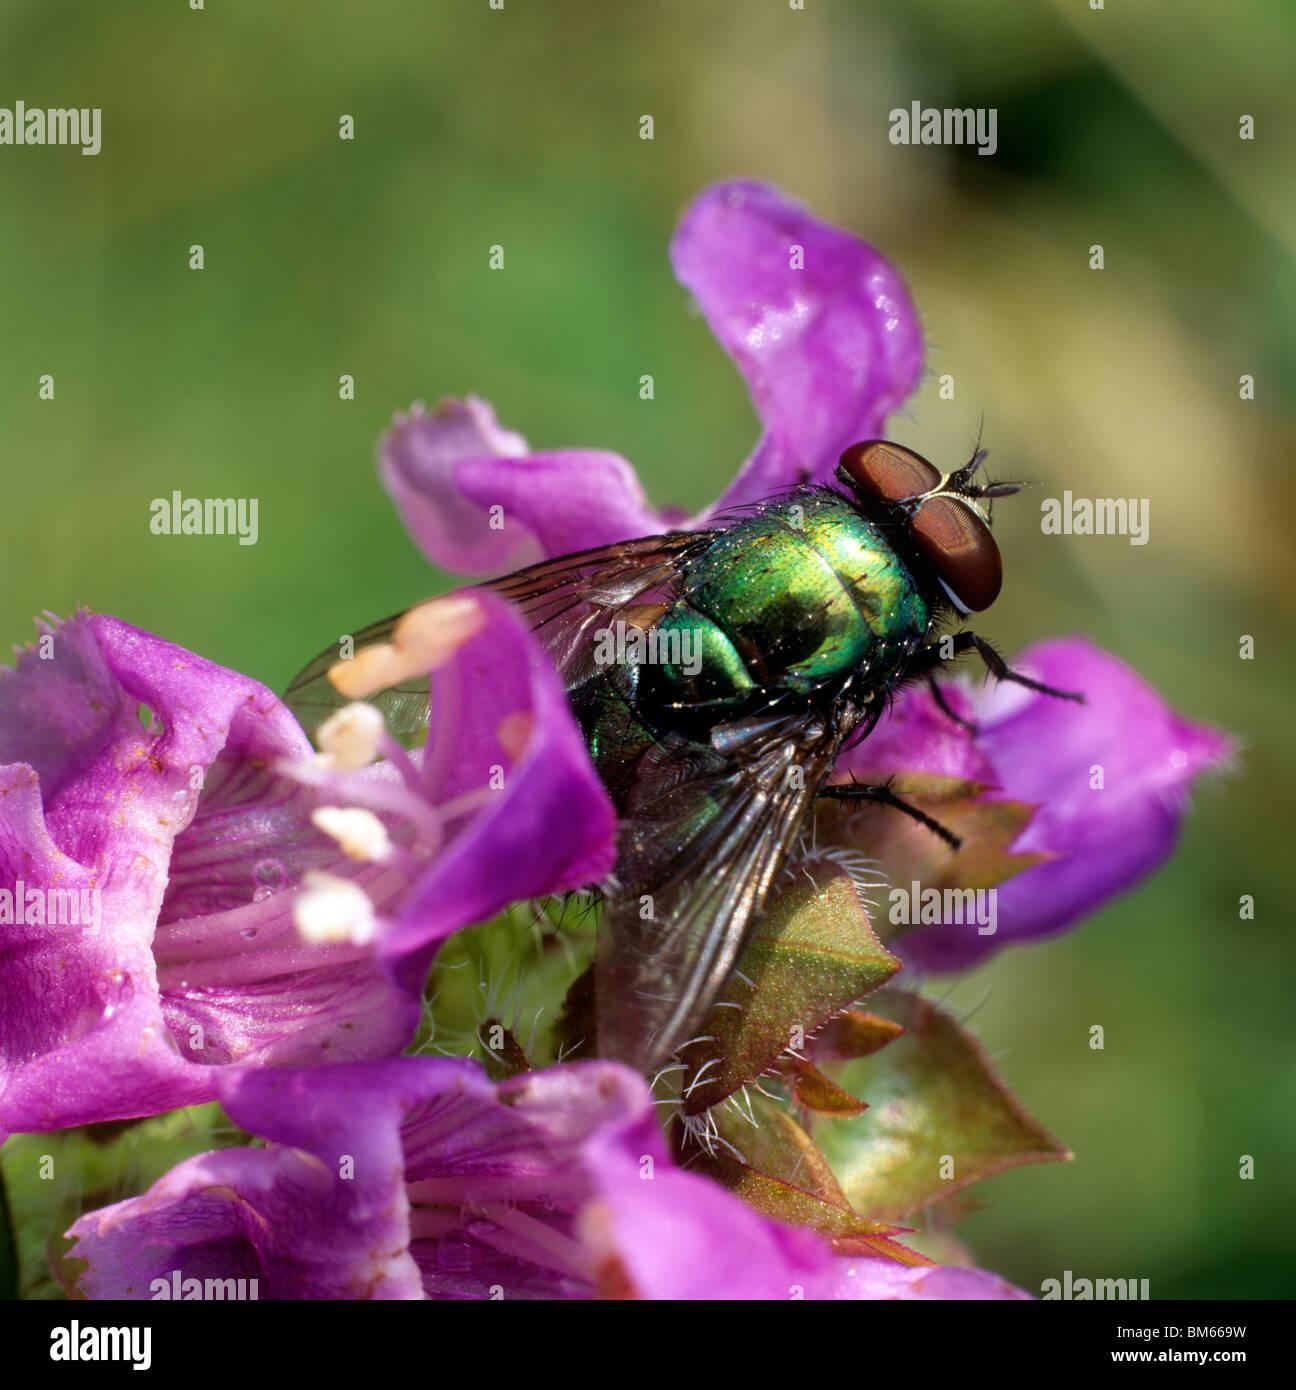 Metalic fly (Neomyia cornicina) on a flower. - Stock Image